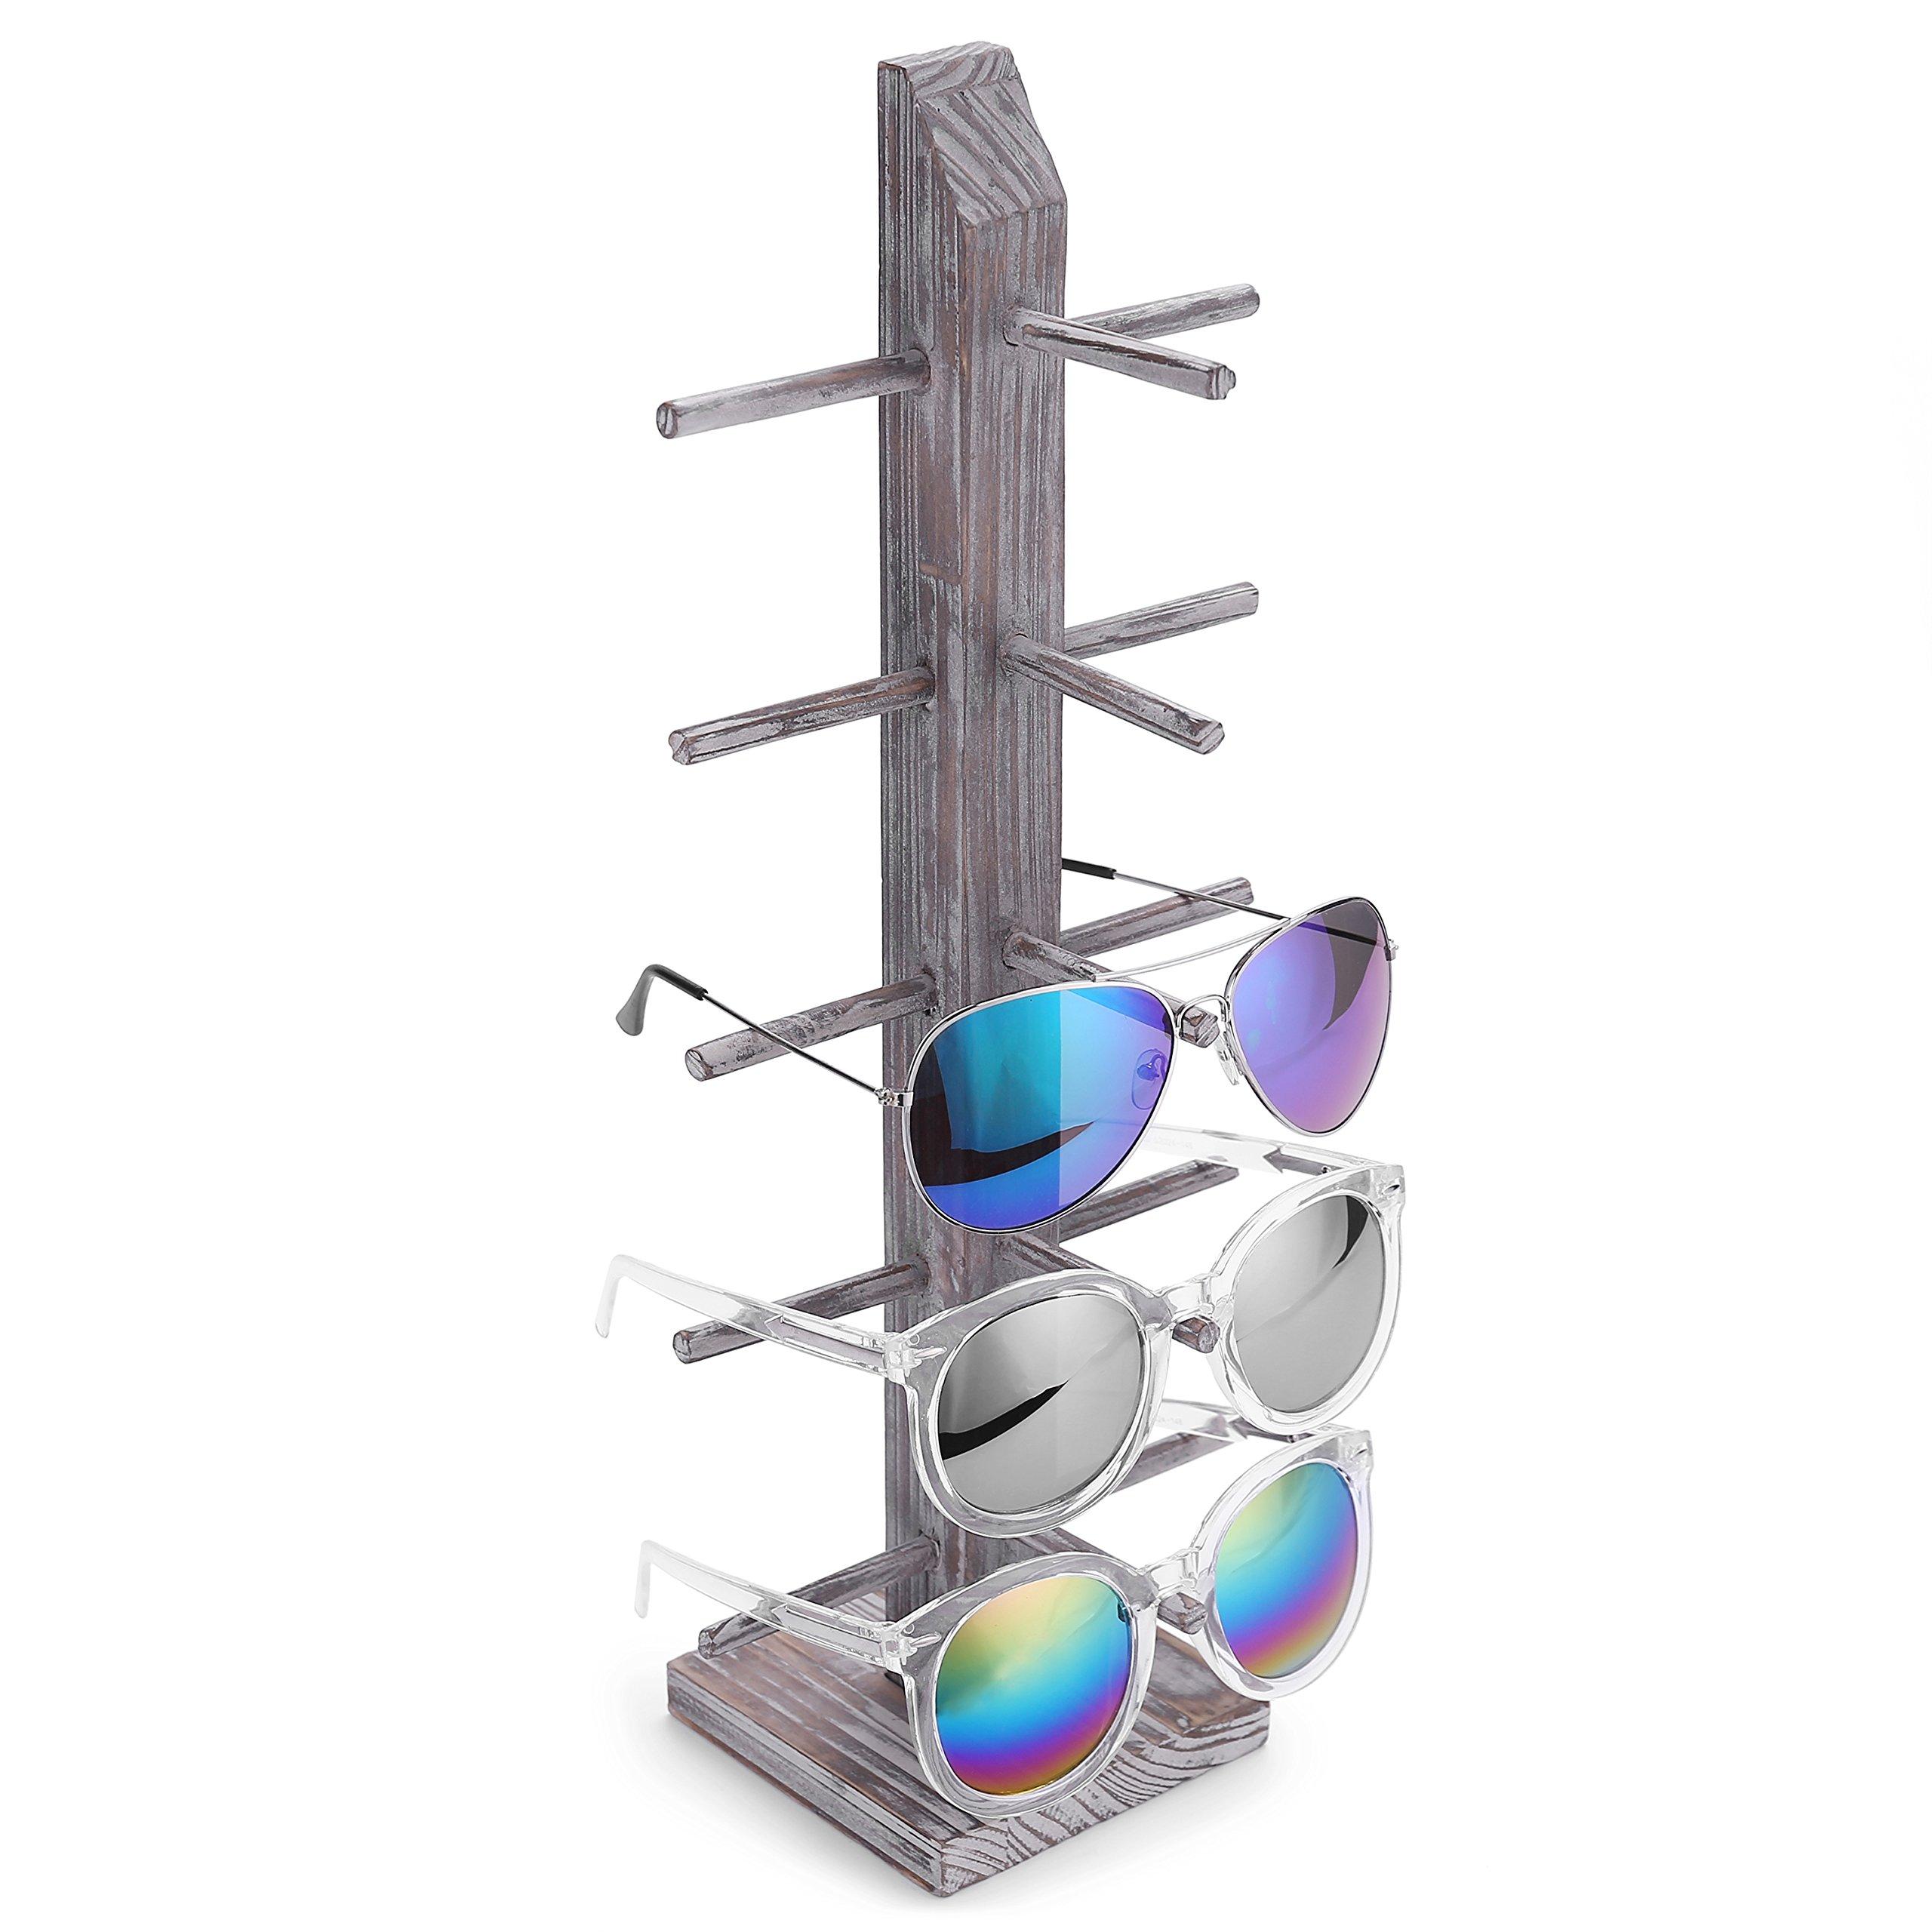 Rustic Whitewashed Barnwood 5-Pair Sunglasses Display Stand, Tabletop Retail Eyewear Storage Rack by MyGift